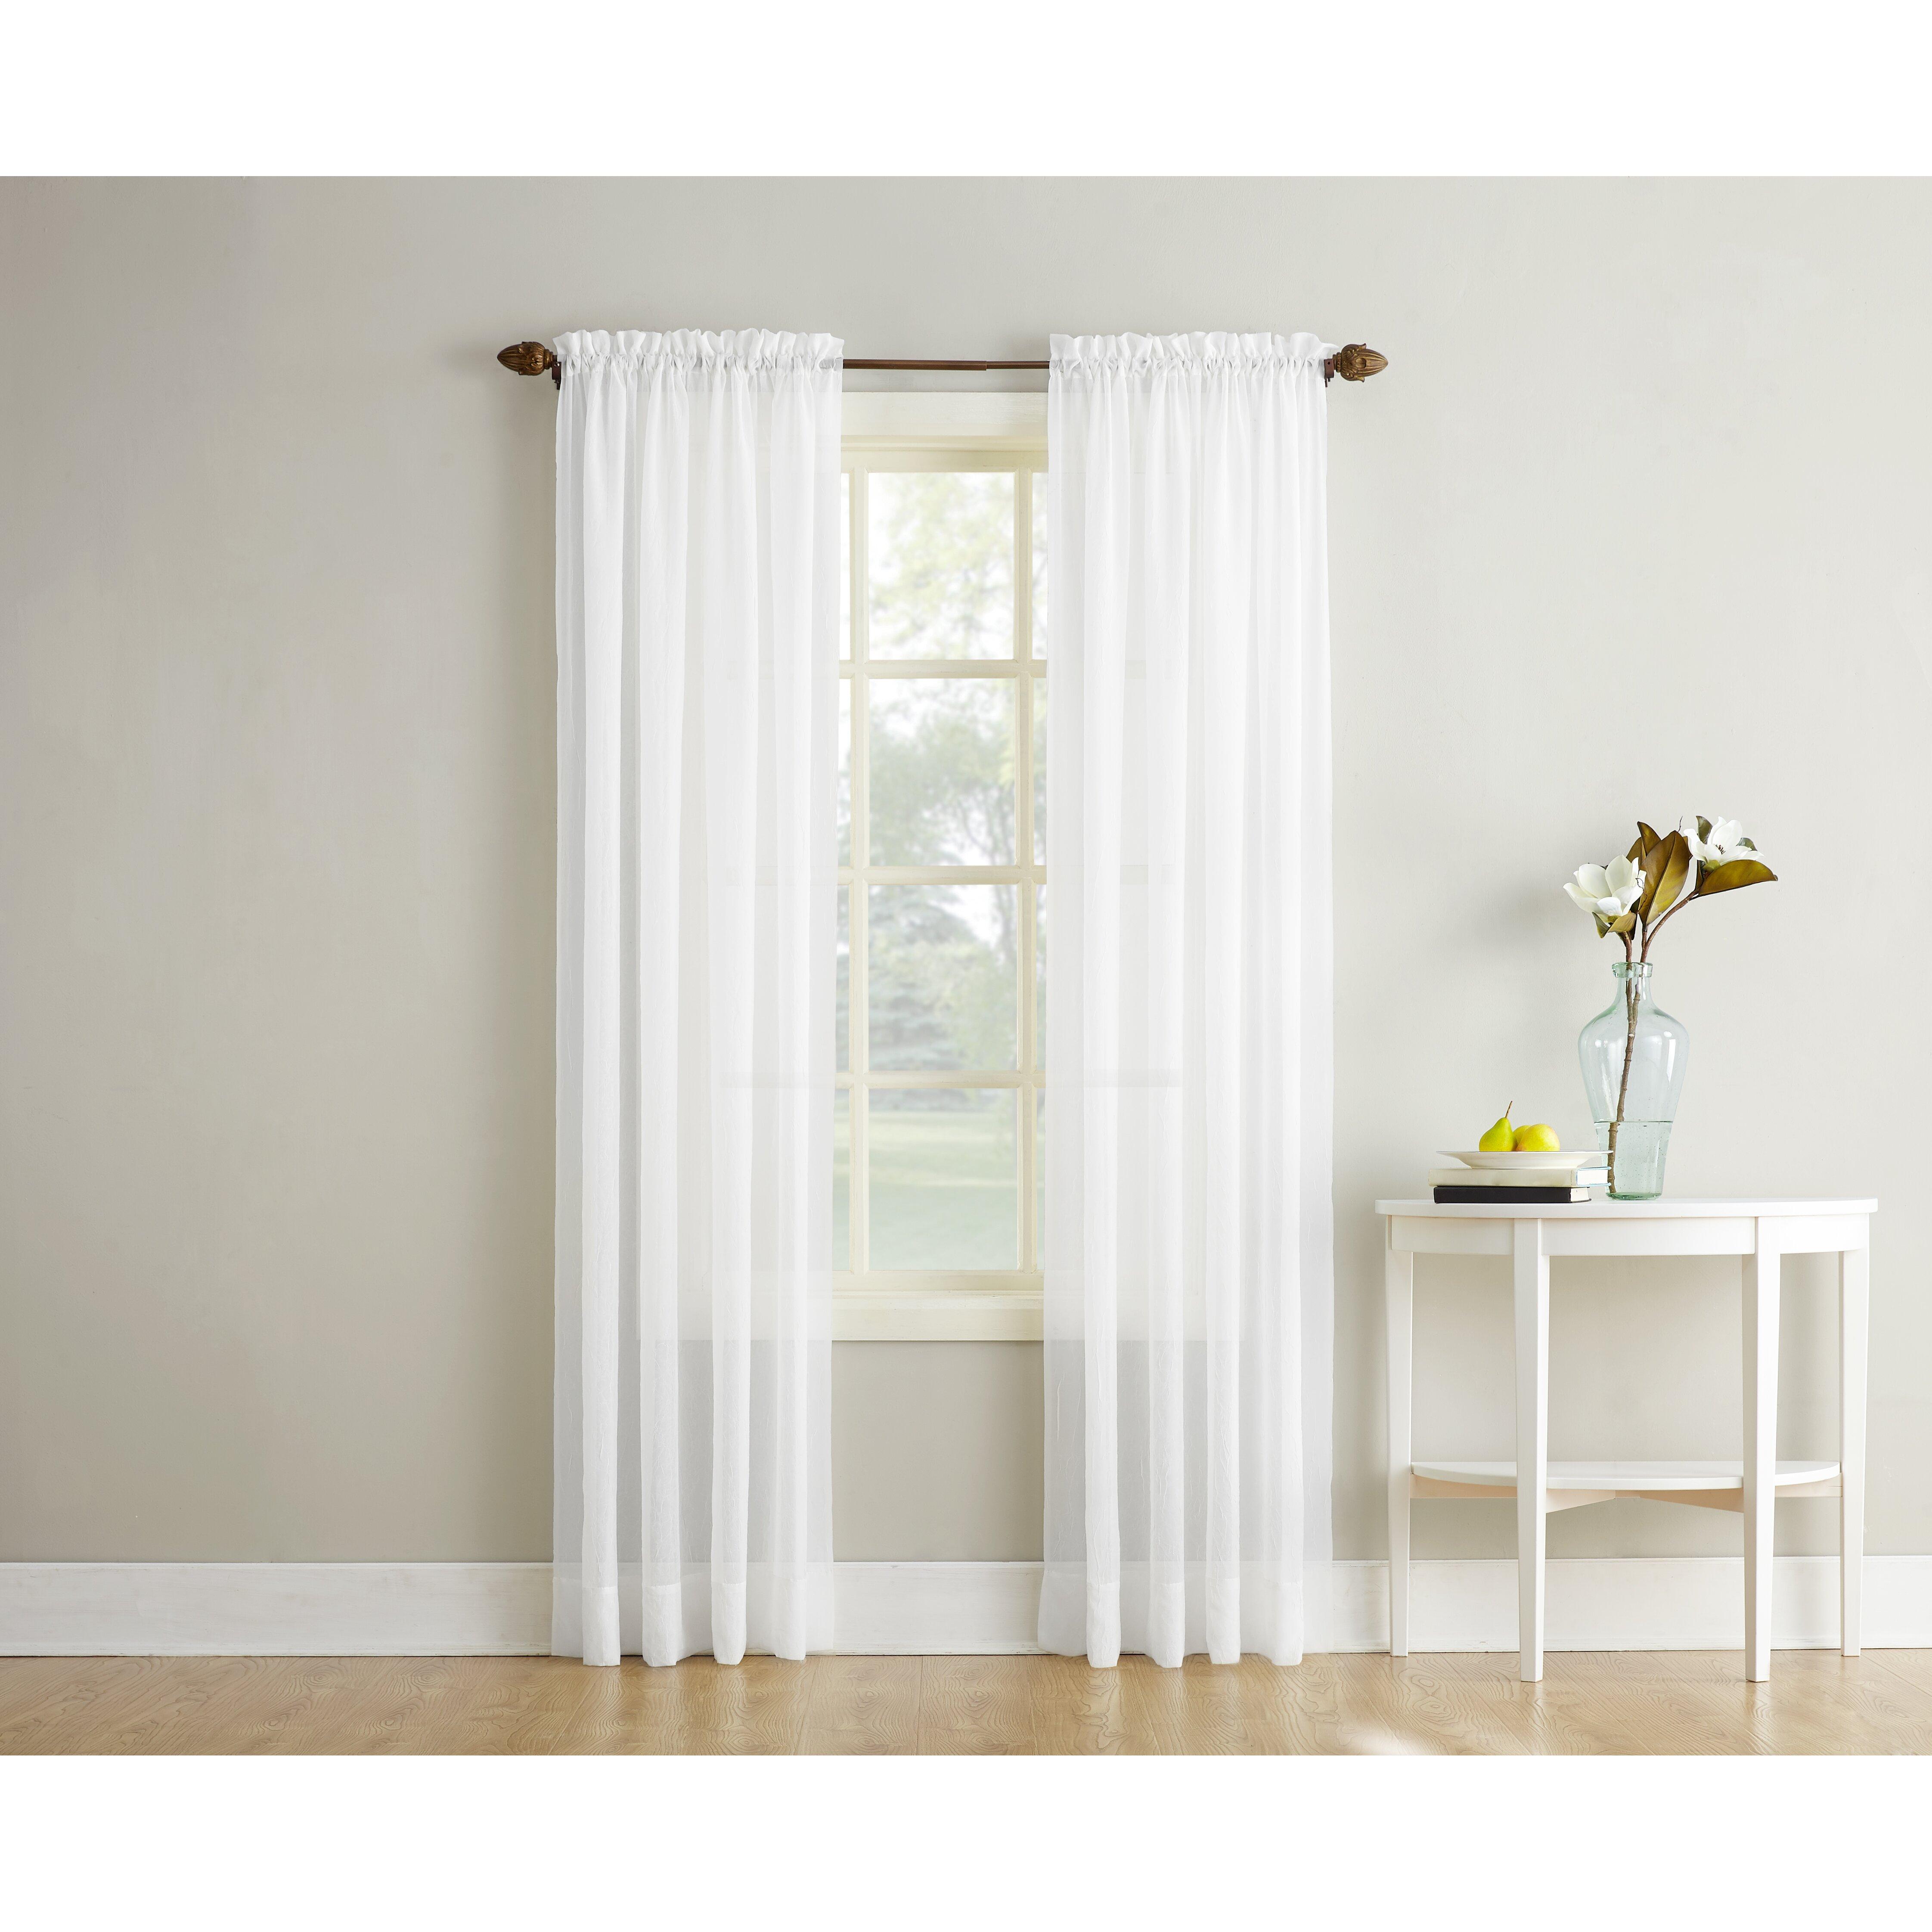 Sheer yellow curtains - Erica Single Curtain Panel